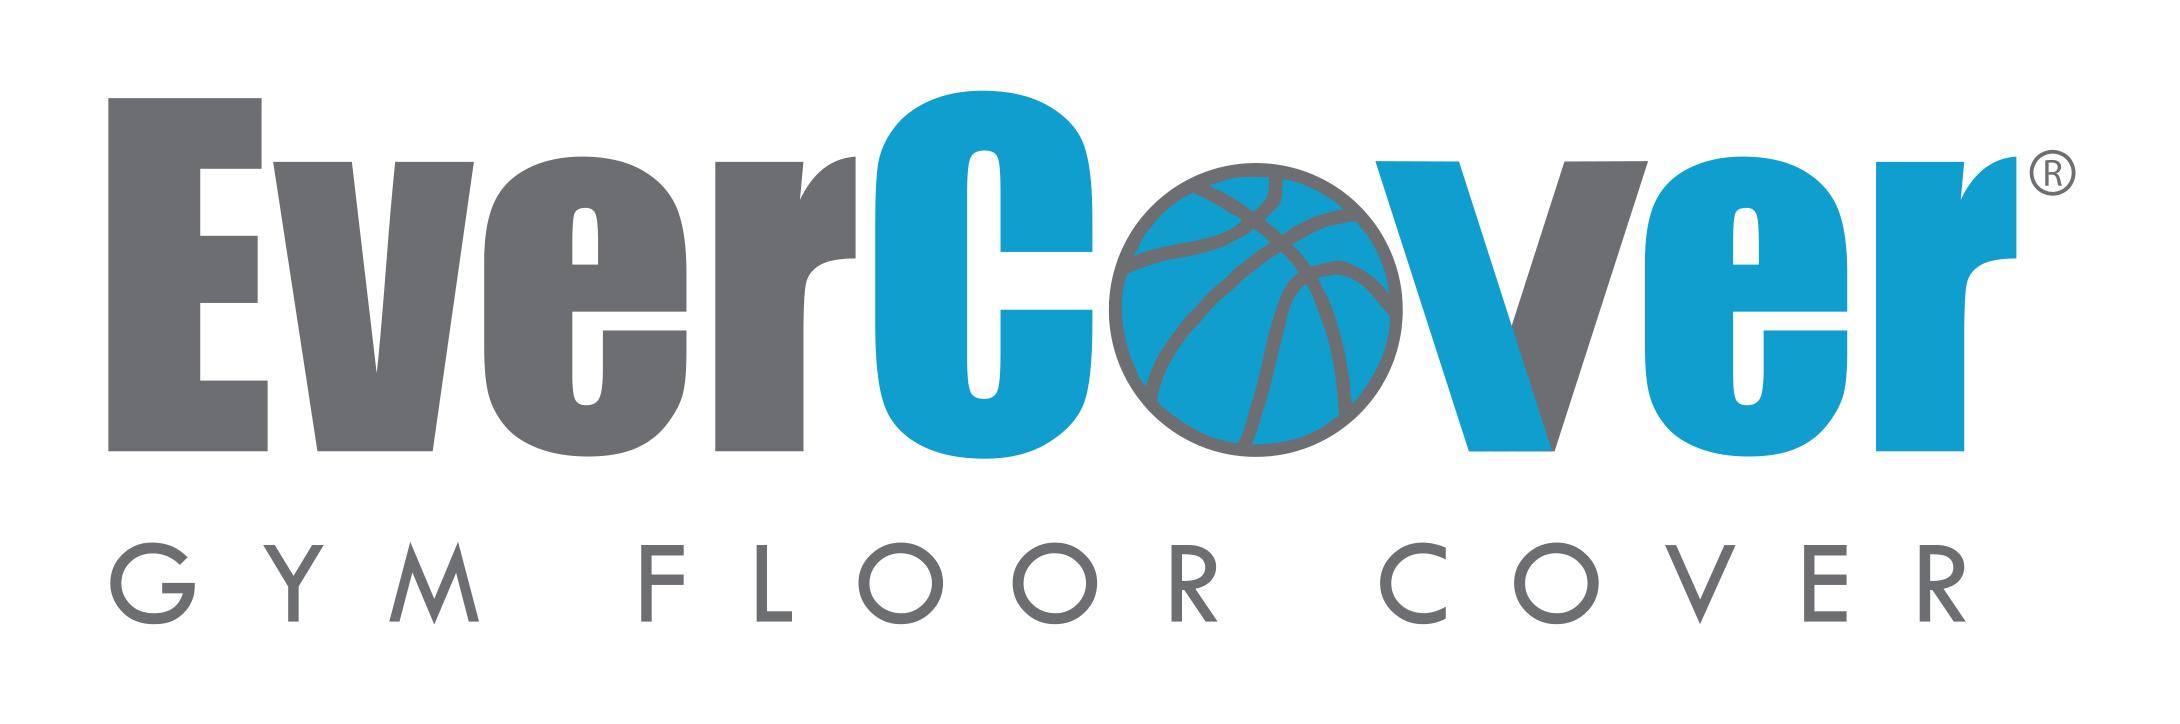 EverCover Gym Floor Cover